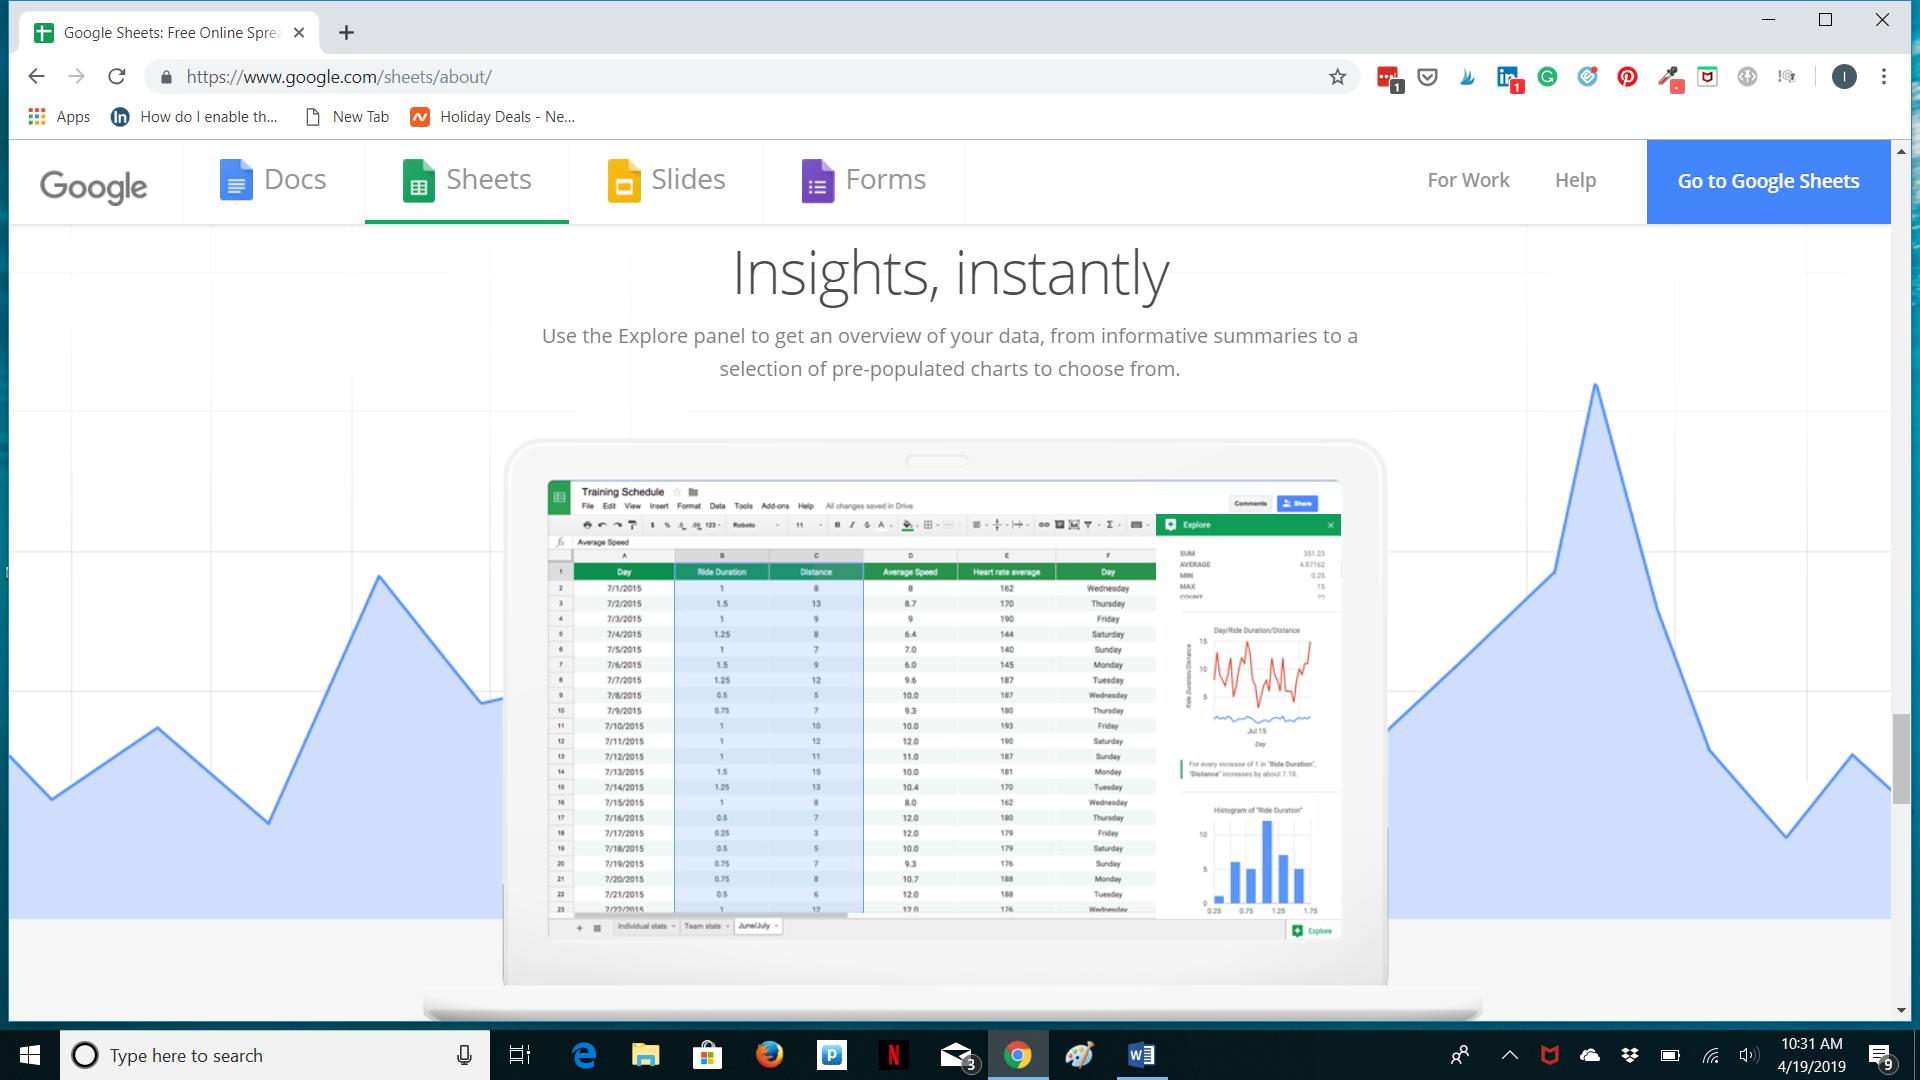 Google Sheets analysis